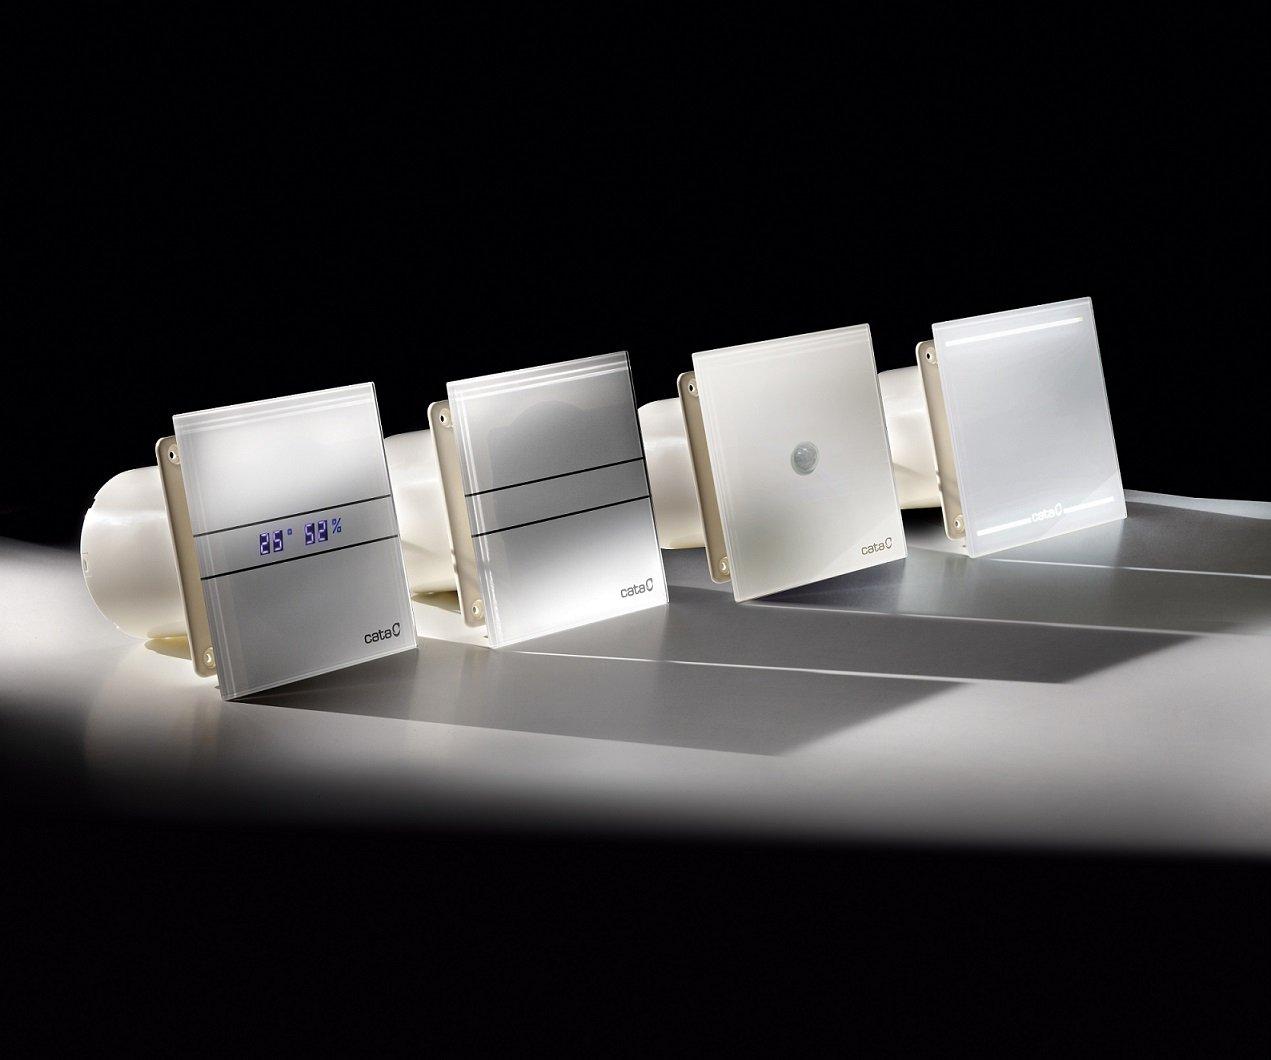 Ventilator / Lüfter / Badlüfter / CATA E 100 G / Standard / Glas /  Glasfront / Stark 115 M³/h / Sehr Leise 31 DB / Energiesparend 8 W /  Kugellager / EU ...